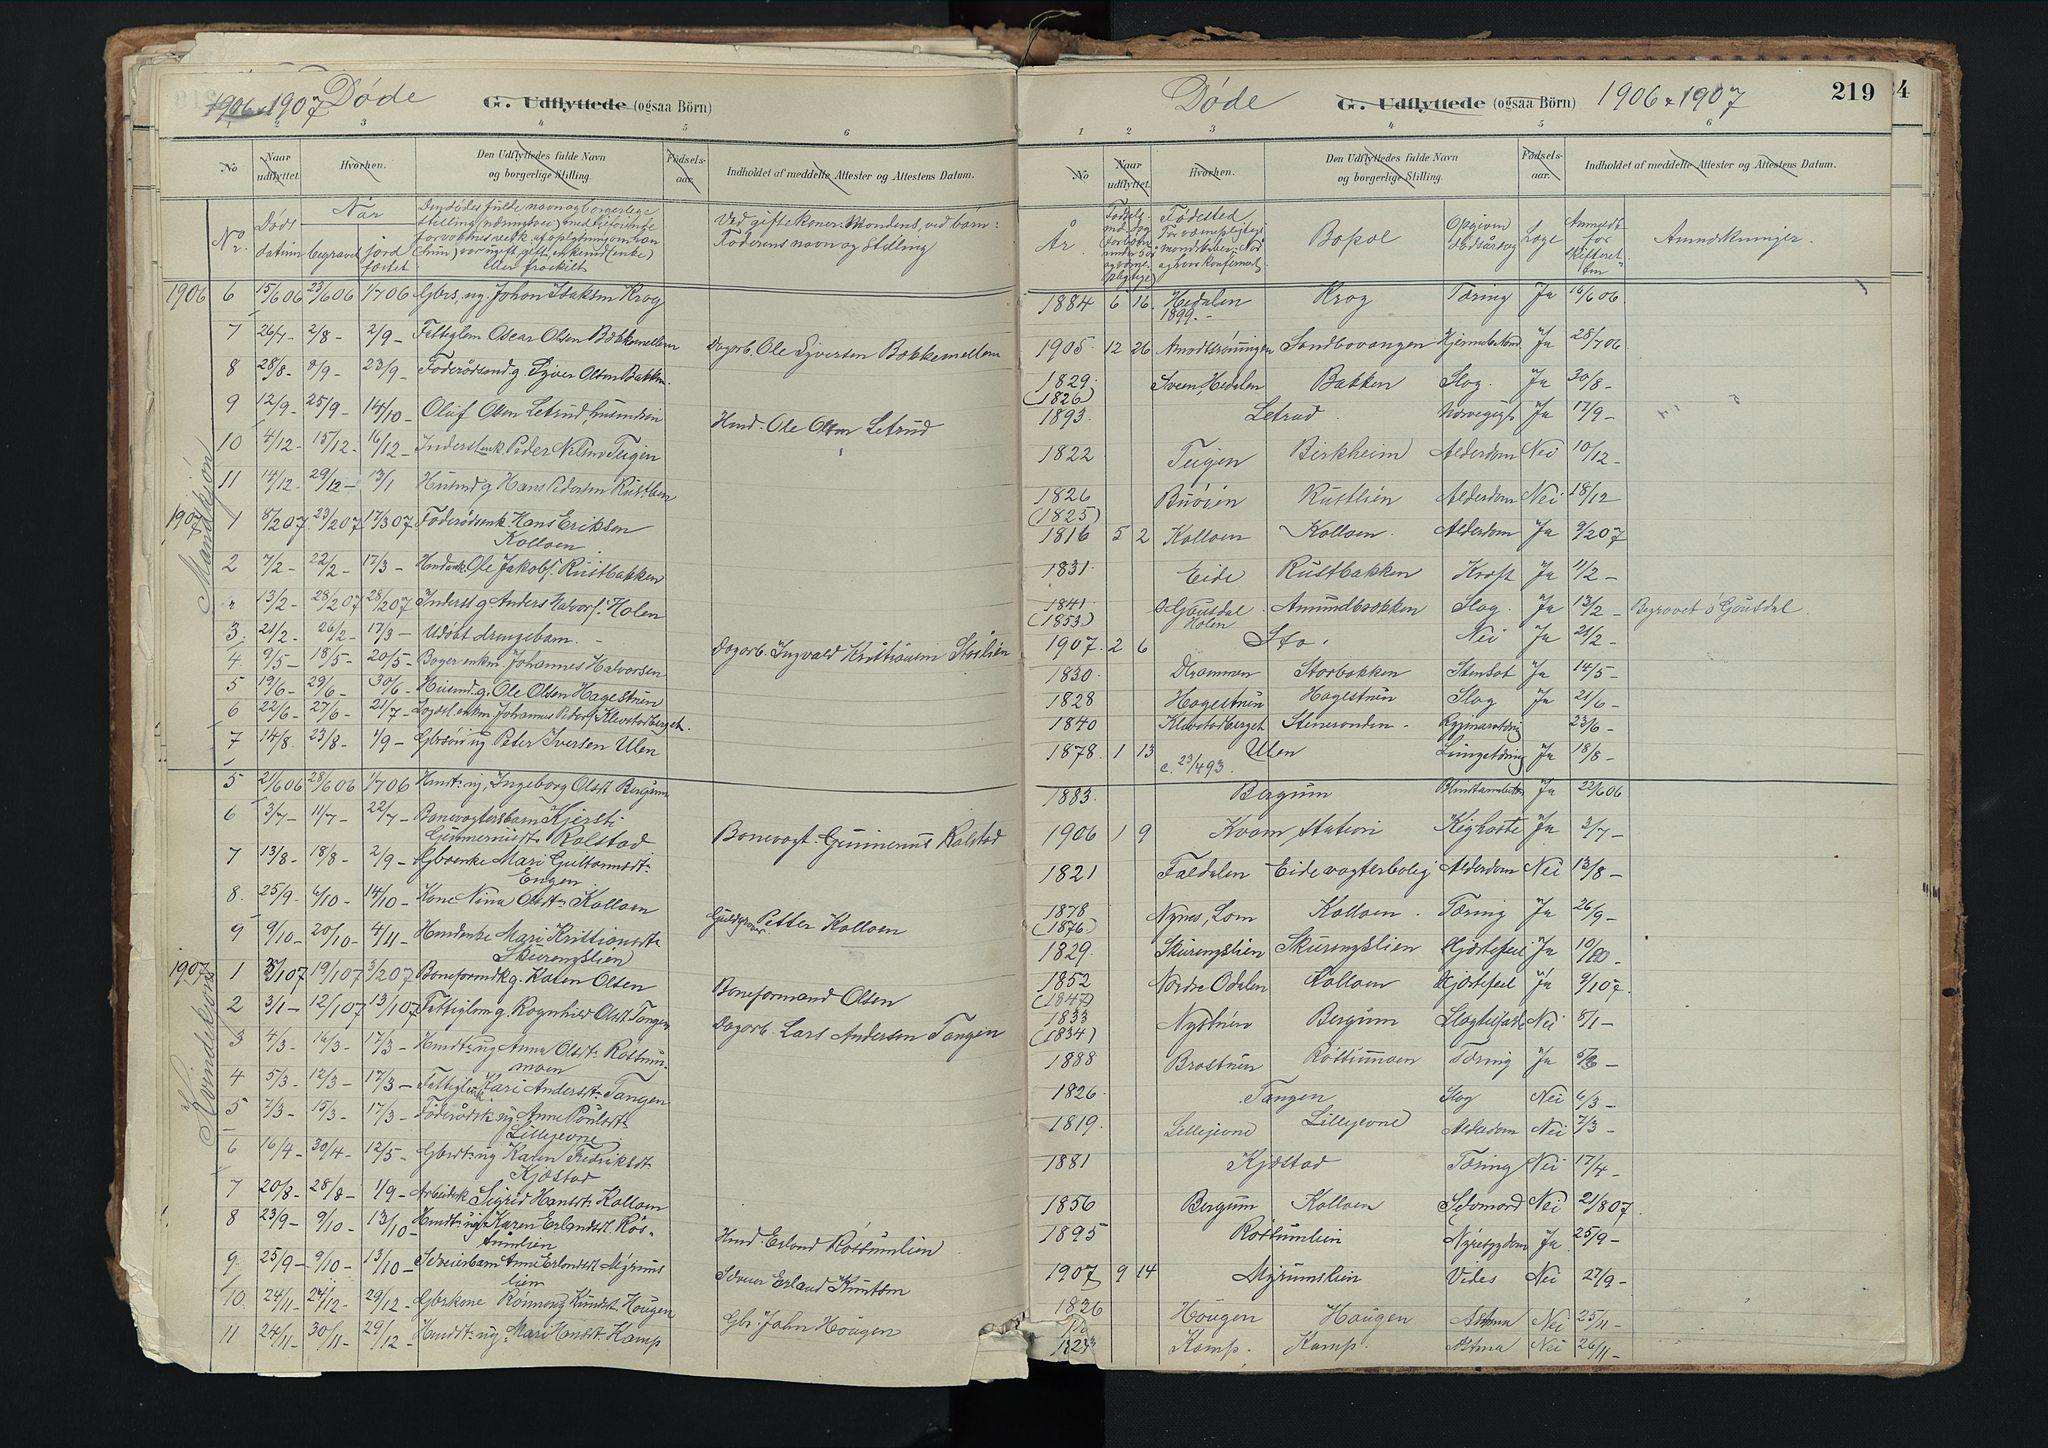 SAH, Nord-Fron prestekontor, Ministerialbok nr. 3, 1884-1914, s. 219